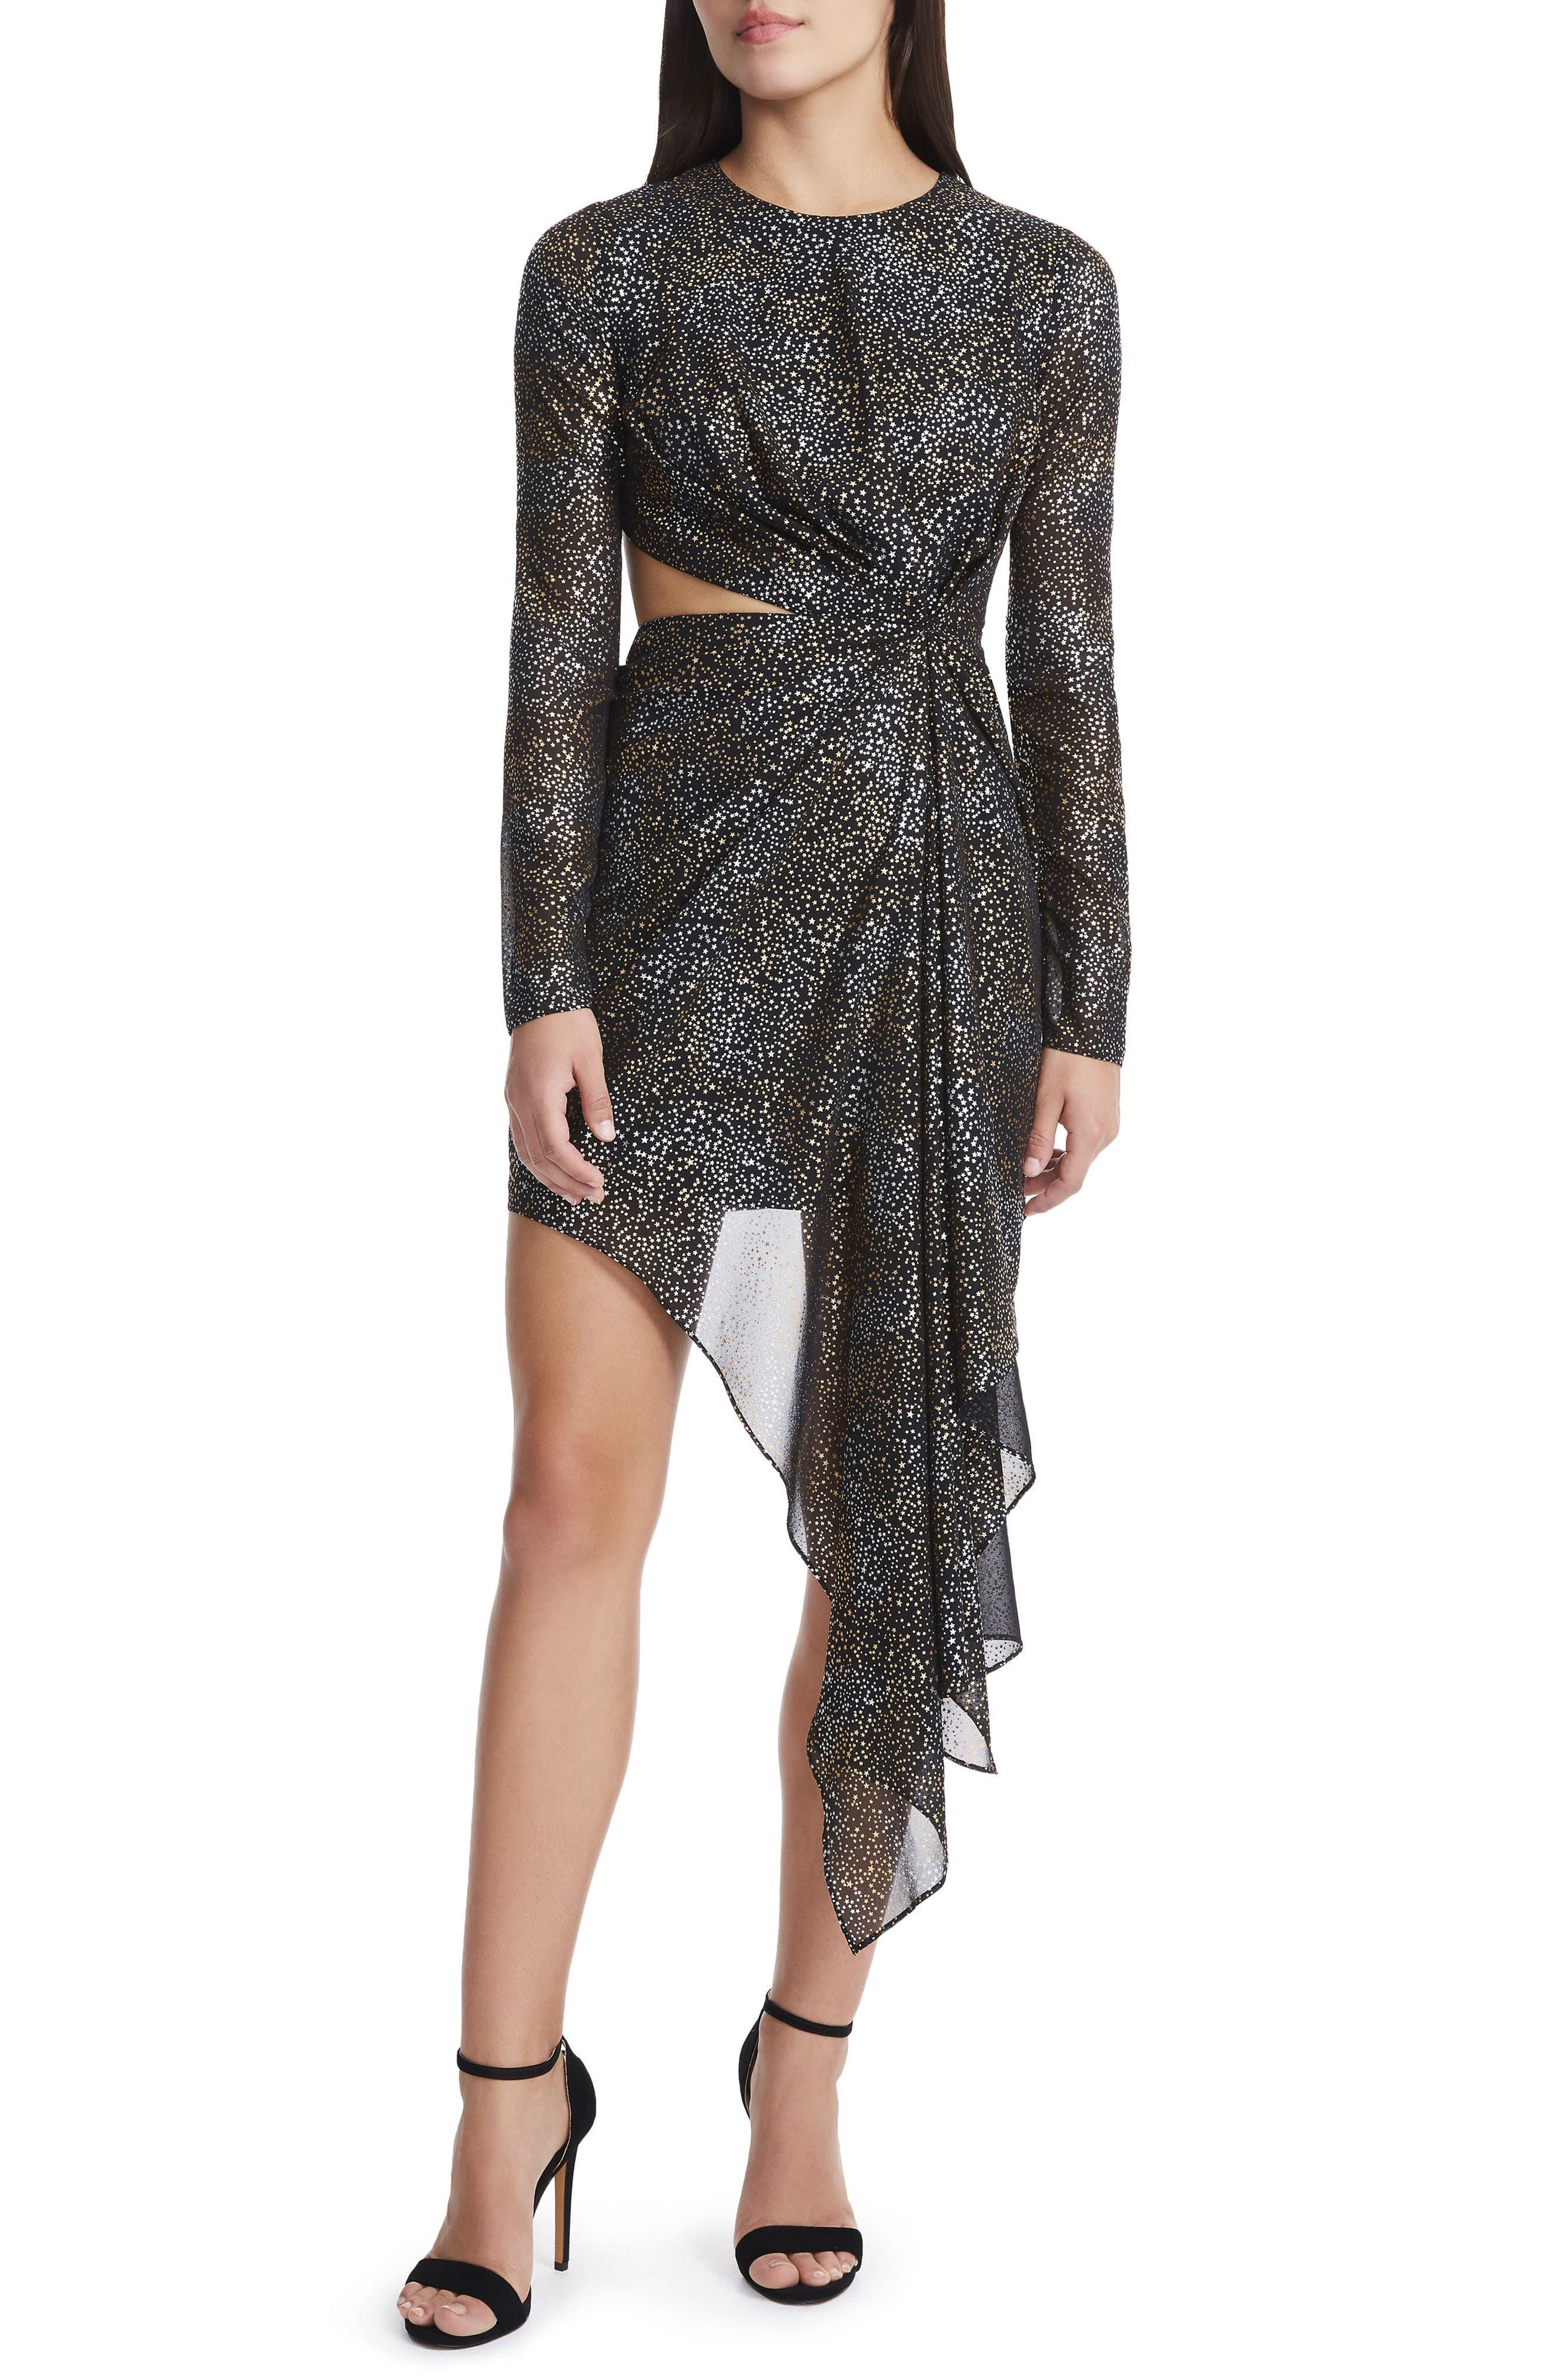 Alternate Image 1 Selected - AFRM Amos Cutout Foil Print Dress